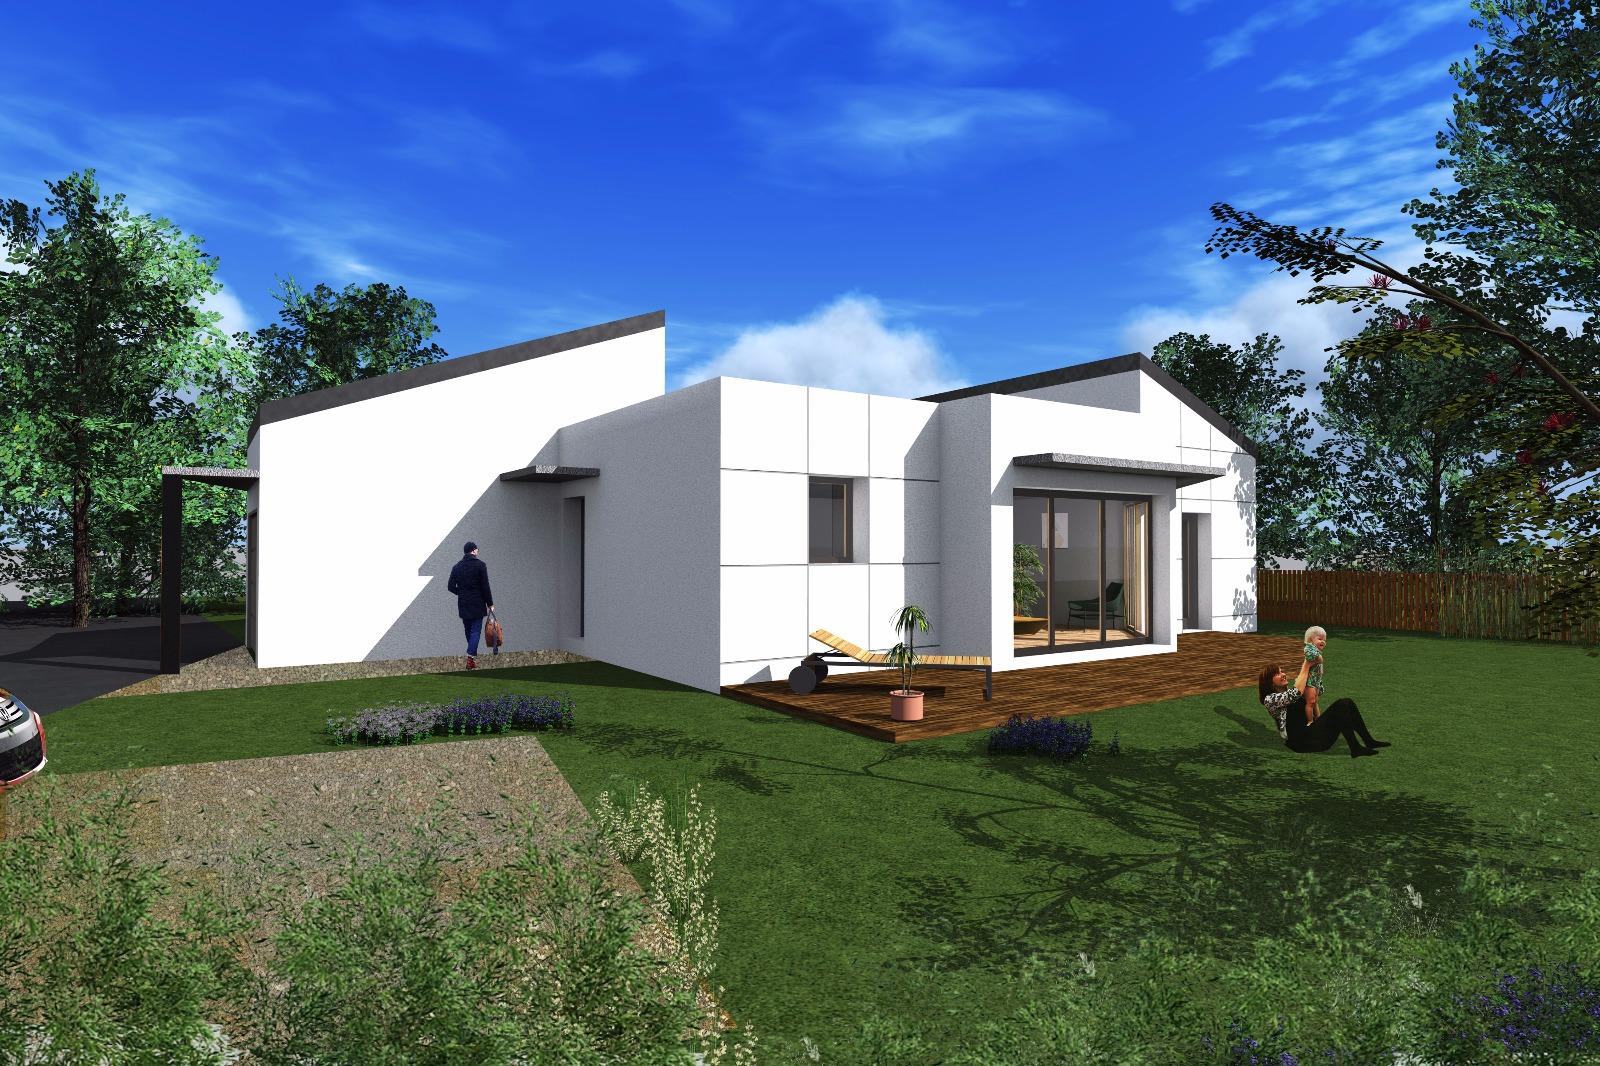 Achat contemporaine Muzillac en Morbihan (56190)Muzillac - Maison d ...